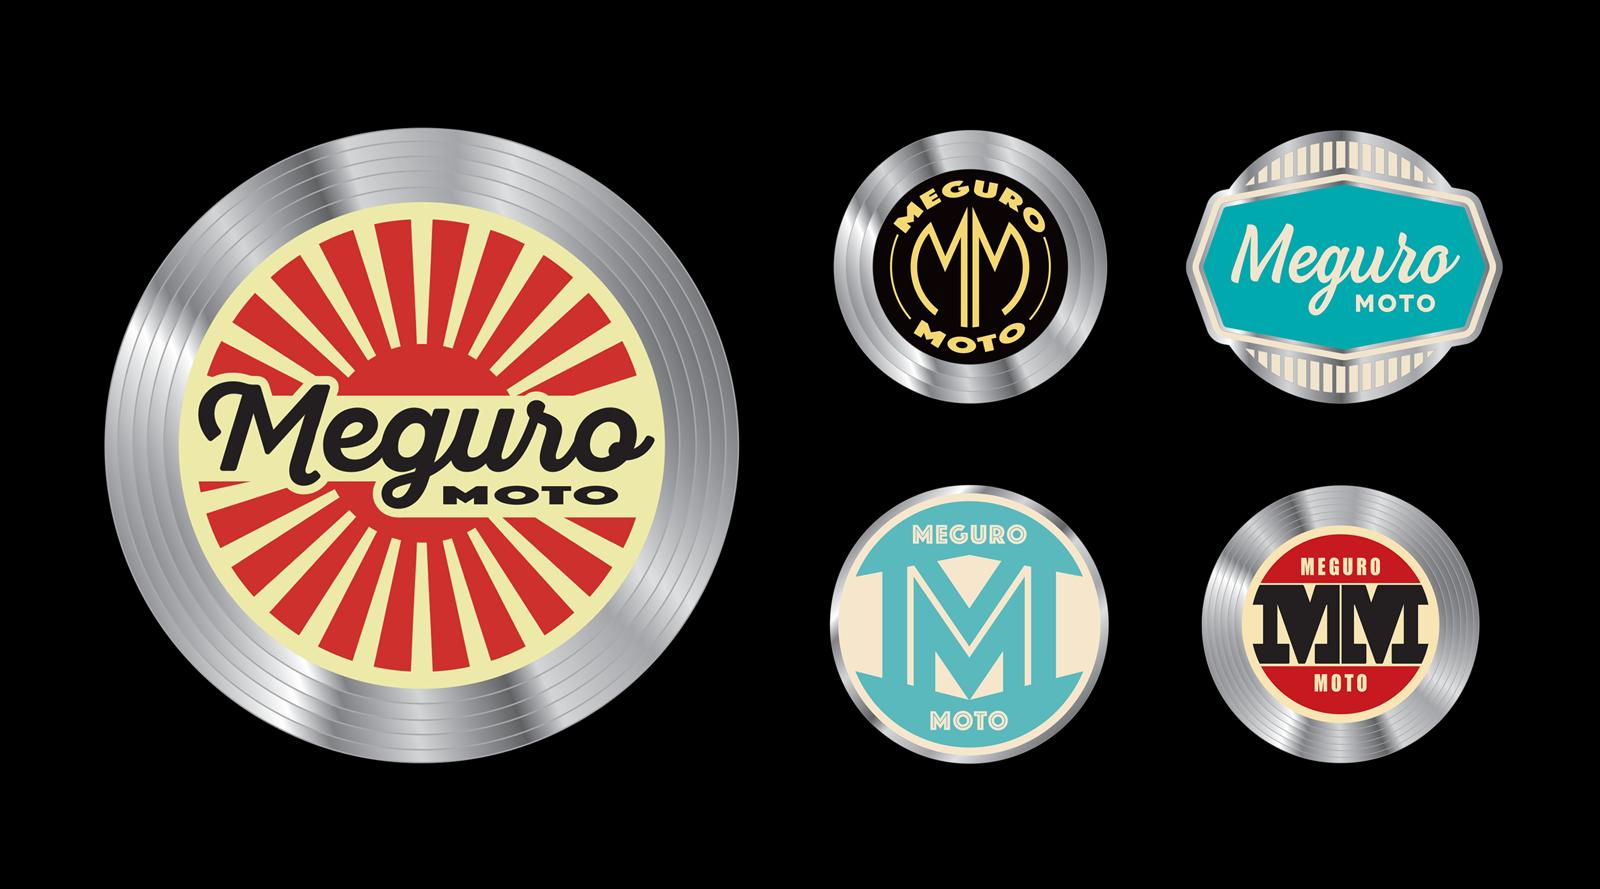 Meguro motorcycle logo development